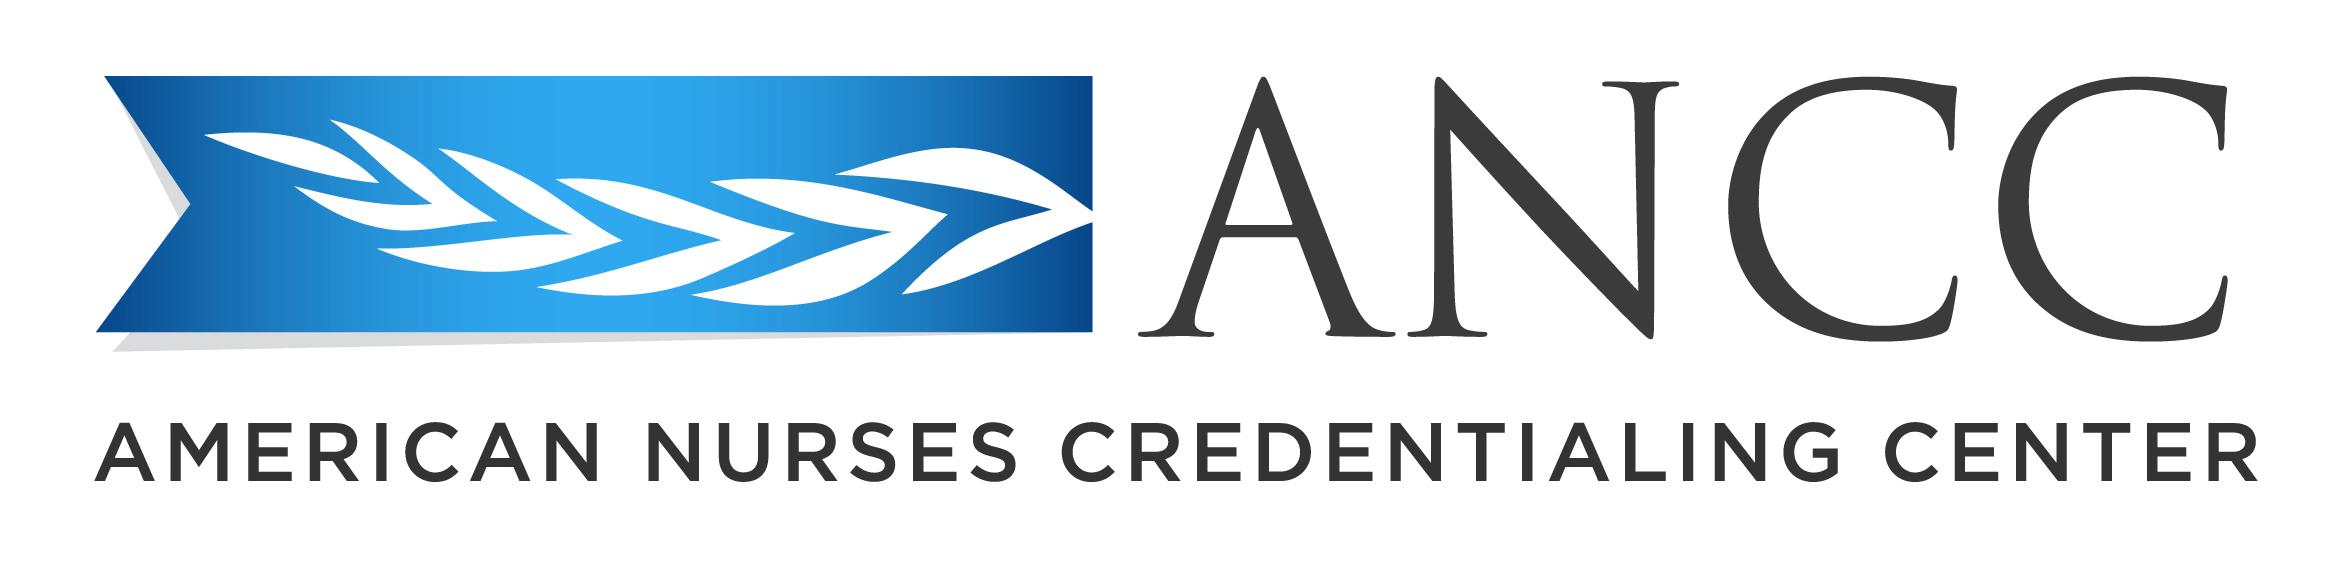 ancc nurses nursing isong credentialing american center certification nurse certified logos academy linda accreditation genetics